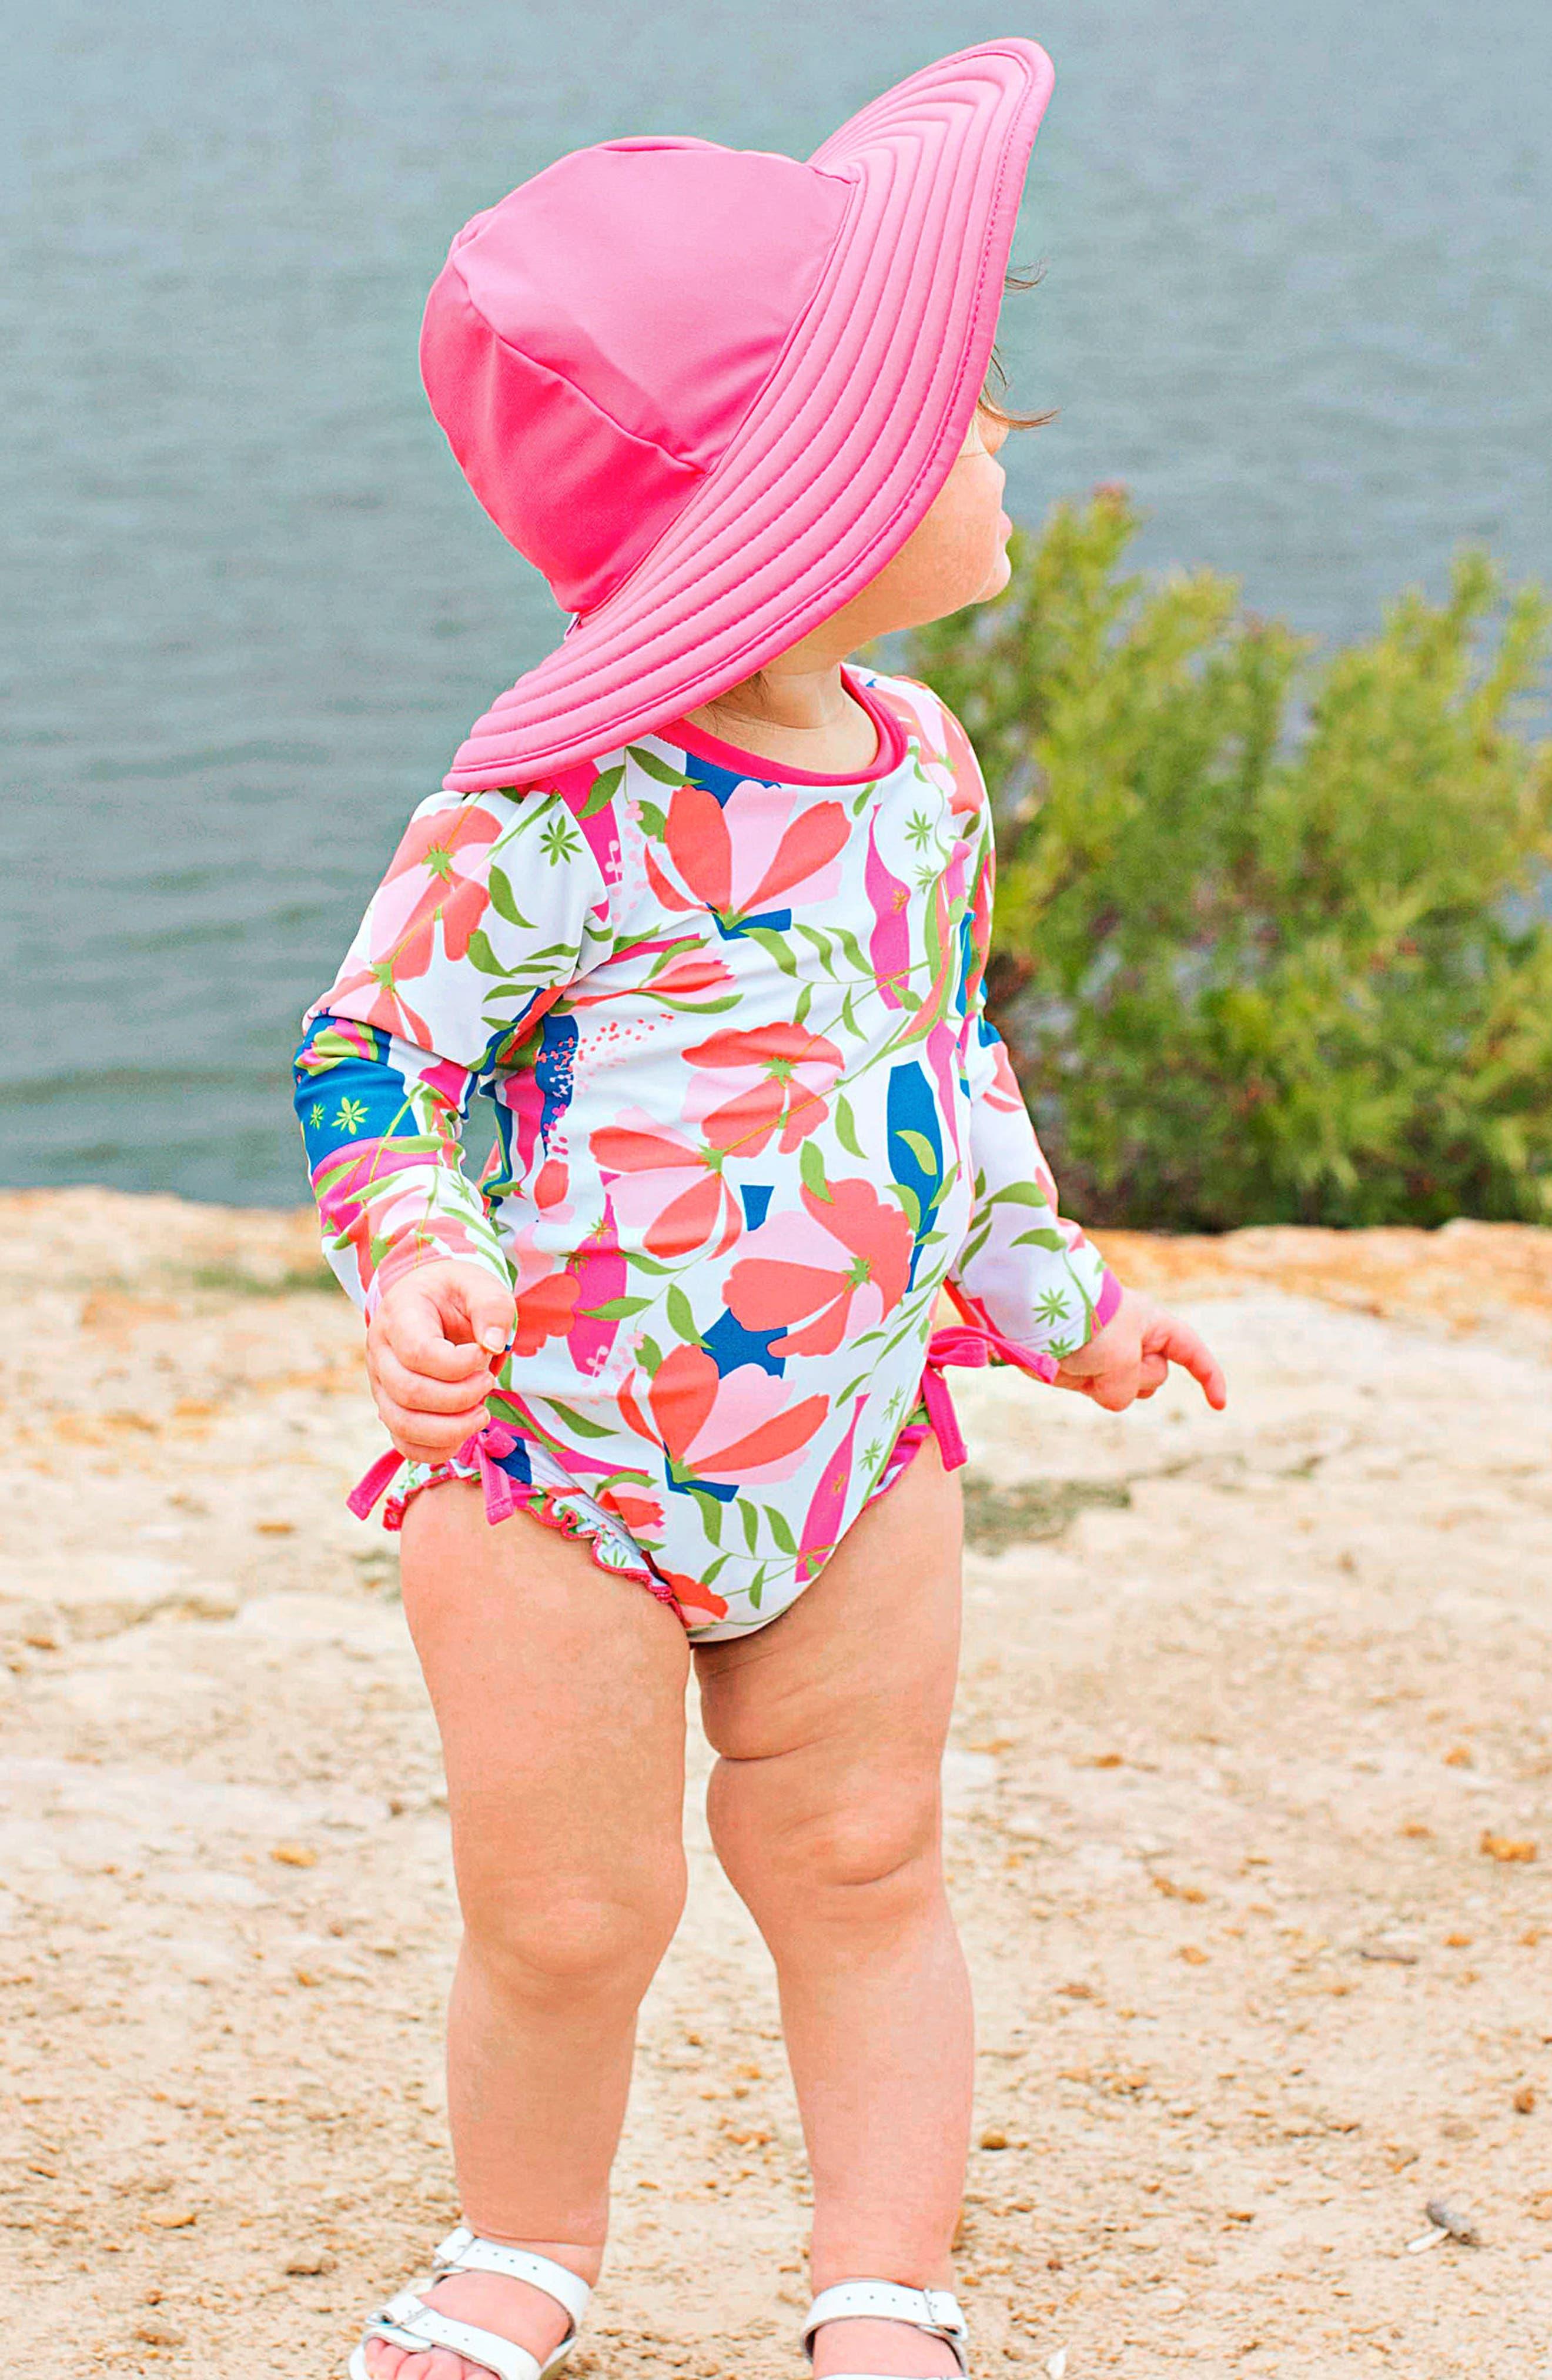 Ruffle Butts Jeweled Stems One-Piece Rashguard Swimsuit & Sun Hat Set,                             Alternate thumbnail 3, color,                             670